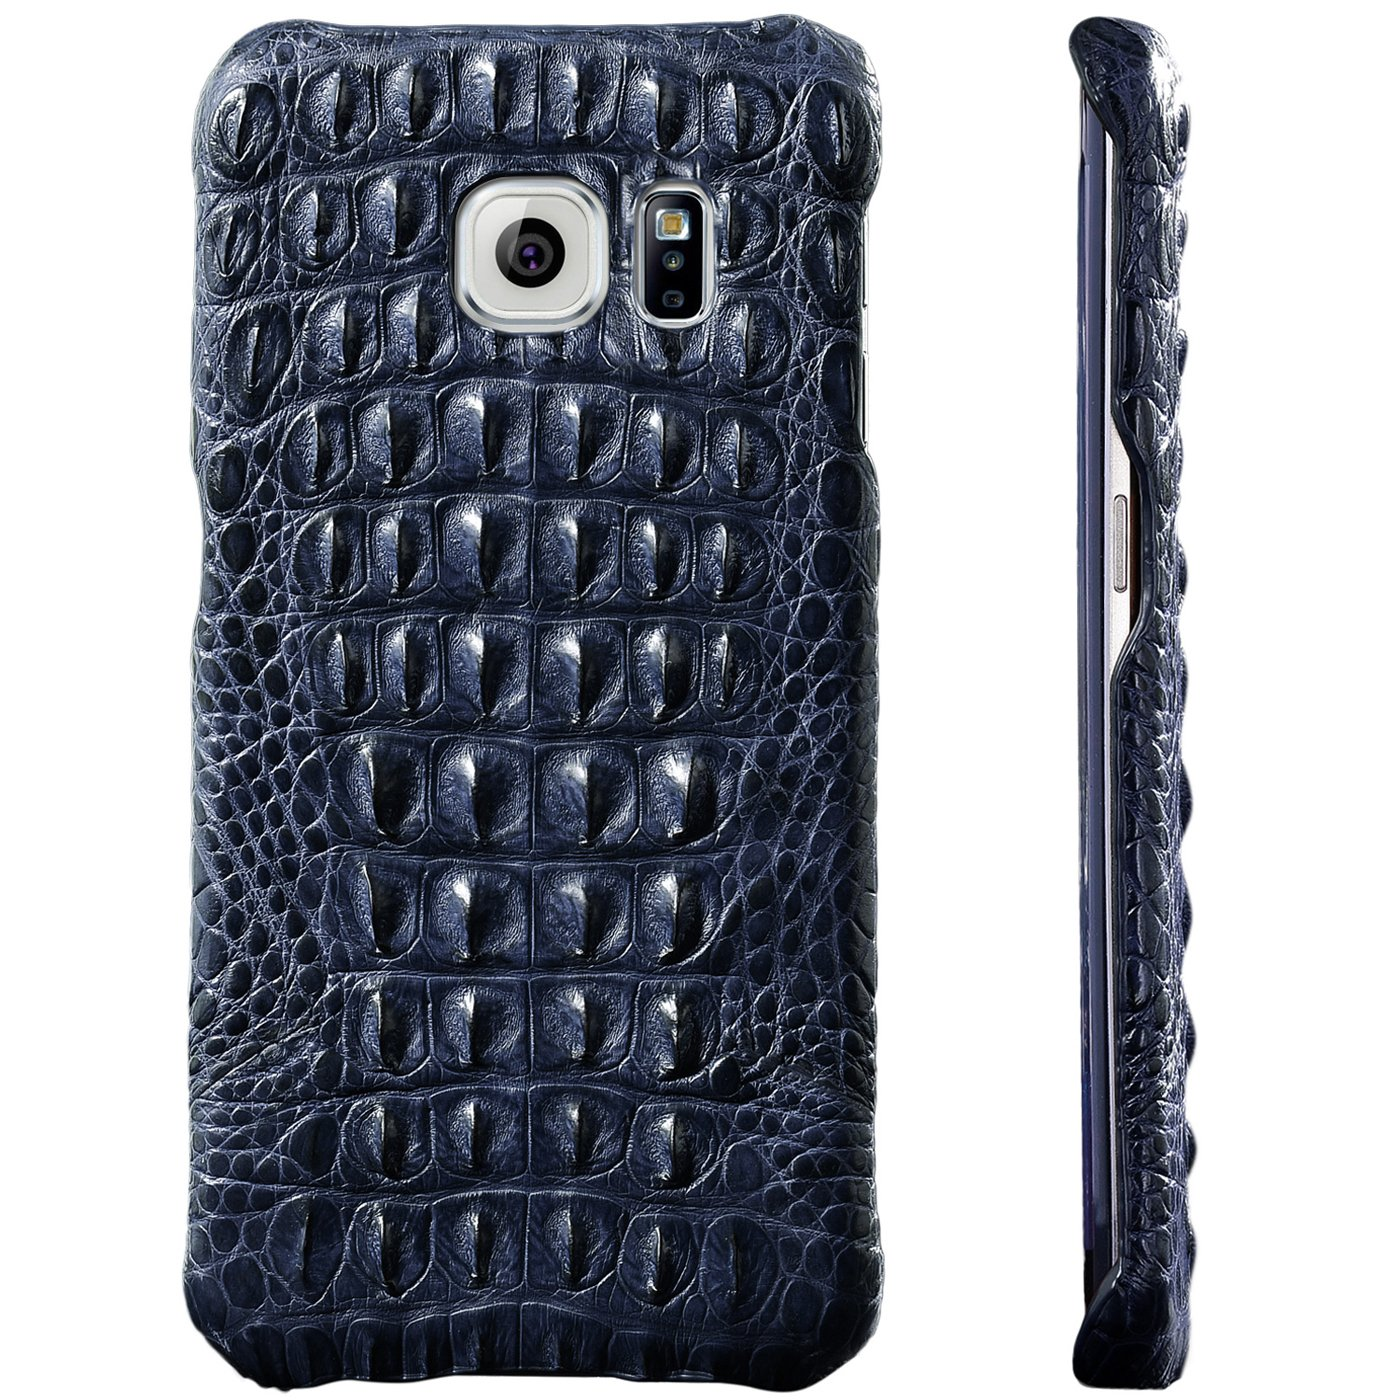 UU&T PREMIUM CROCO - 100% Handmade Alligator [Genuine][Luxury] Protective Case with Crocodile Artifact[Simple Design] for Samsung G9280/S6 Edge+ 5.7''(Back Leather) (Dark Blue)